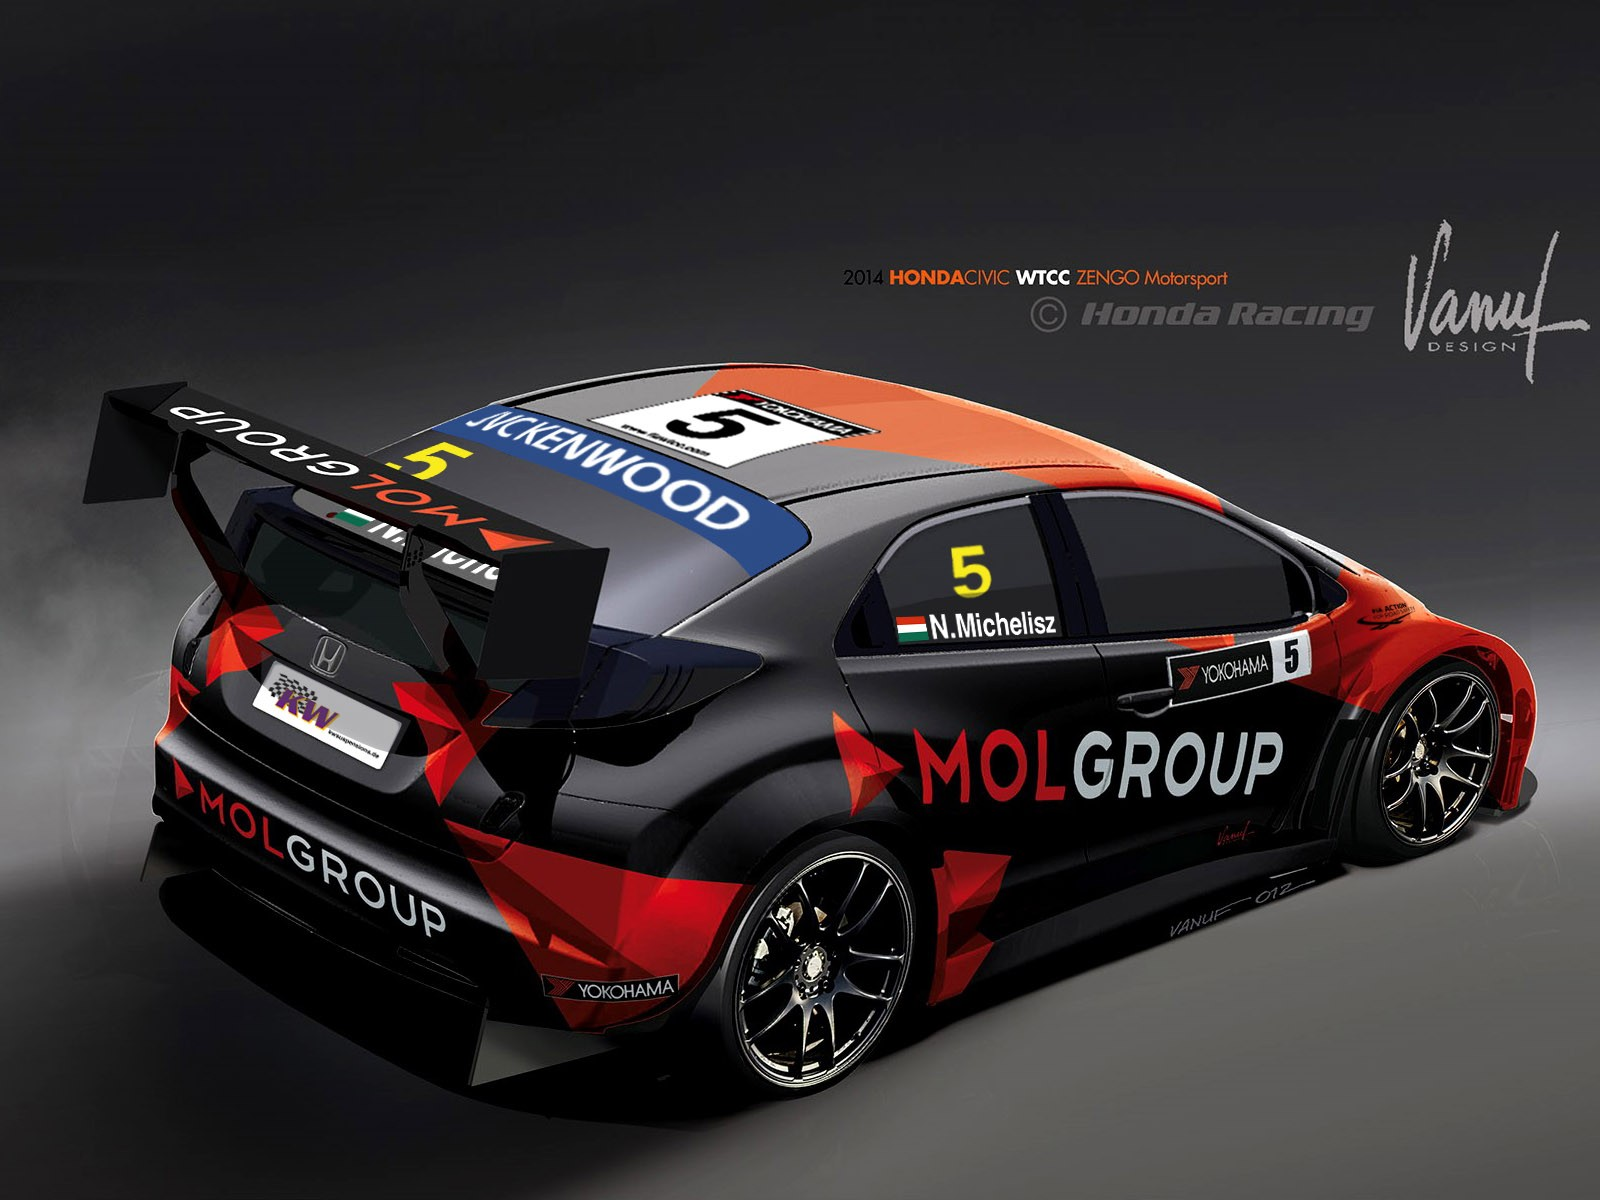 2014 Honda Civic WTCC Zengo Motorsport